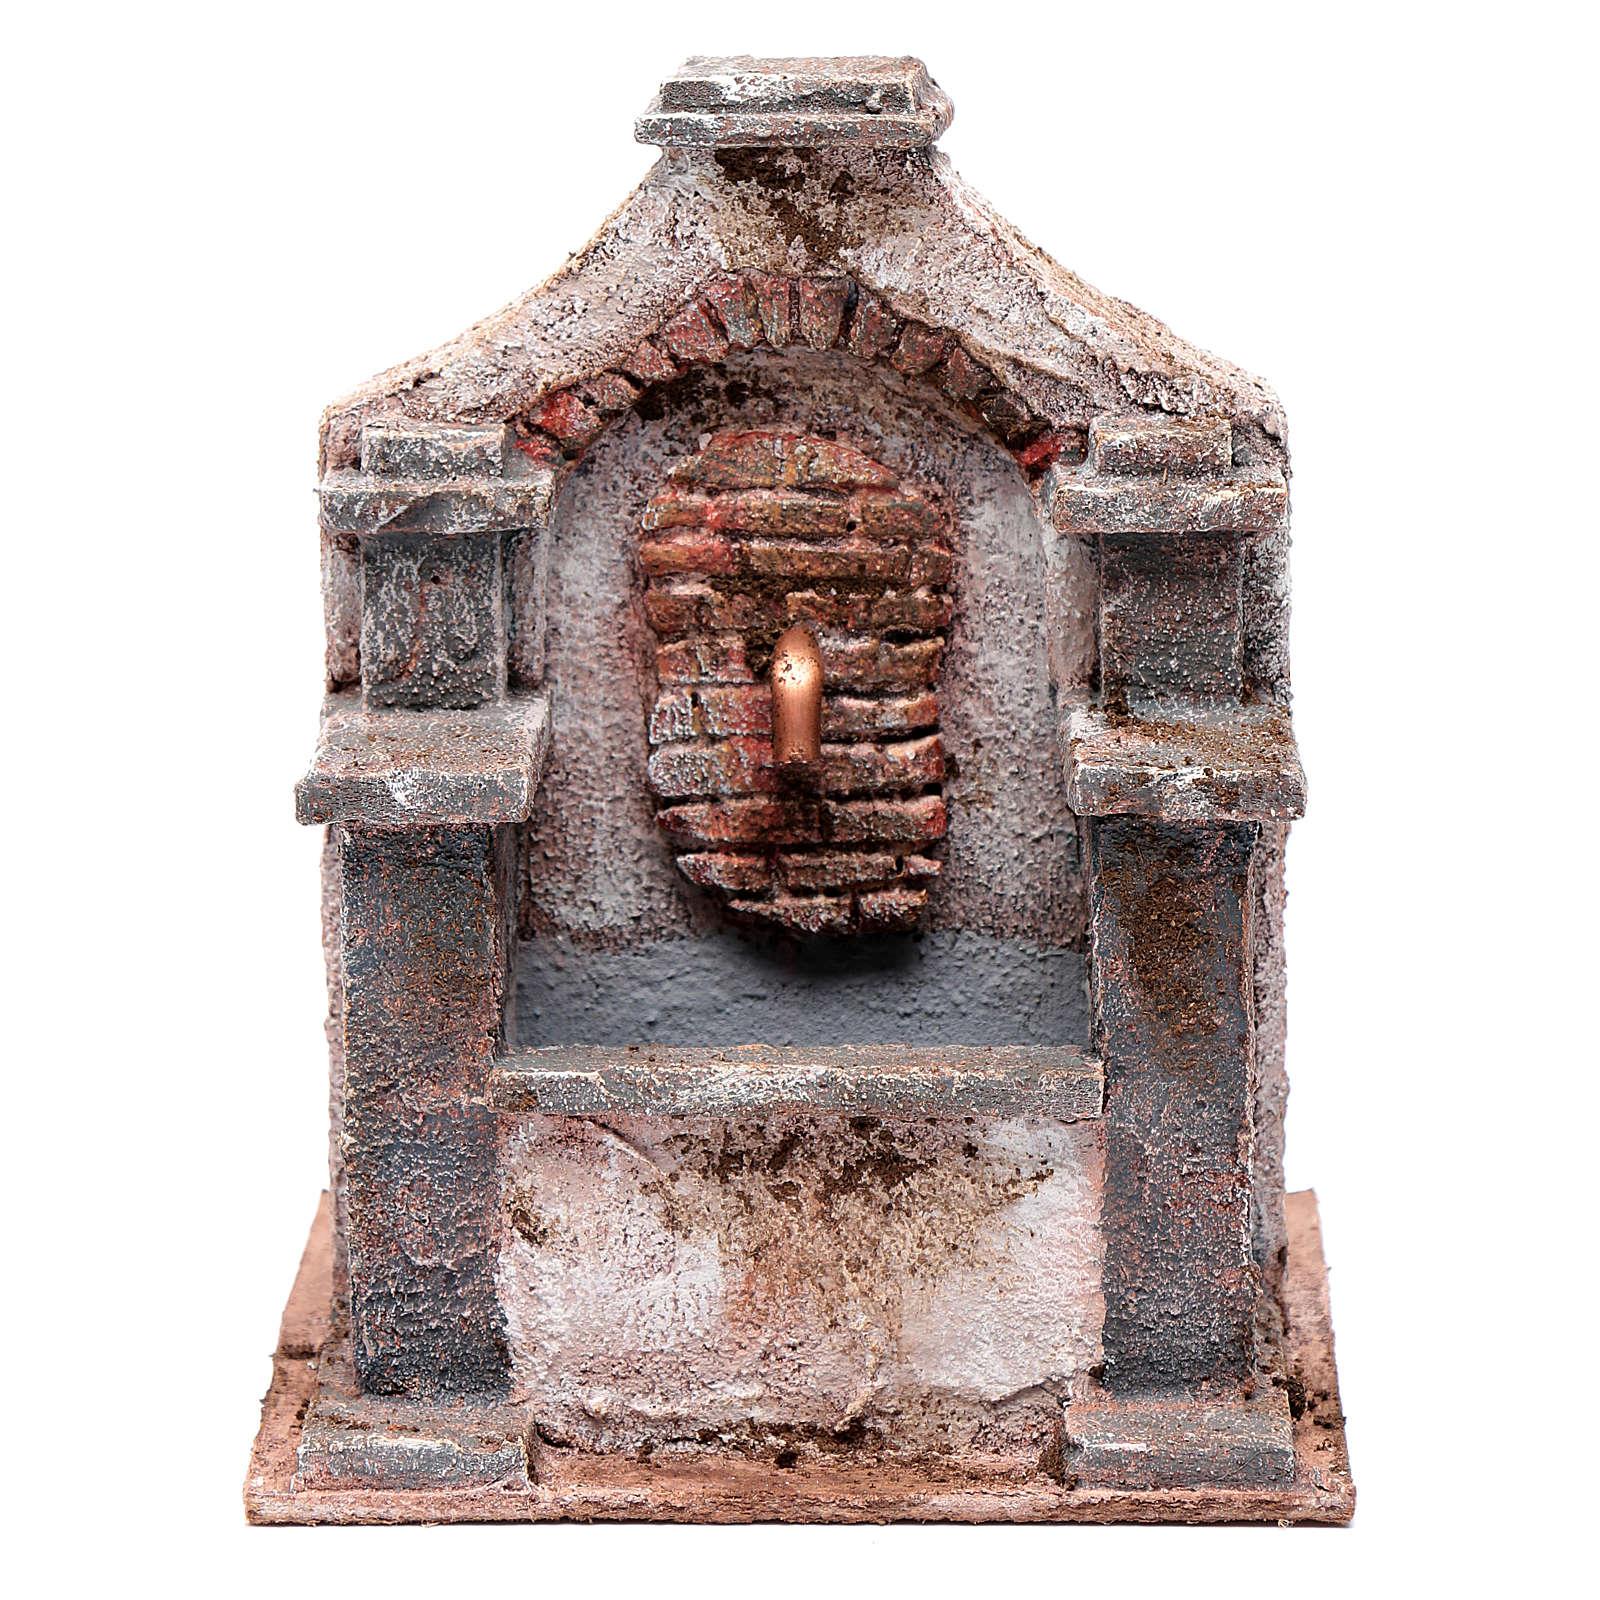 Fontaine en polystyrène pour crèche 20x14,5x14,5 cm 4